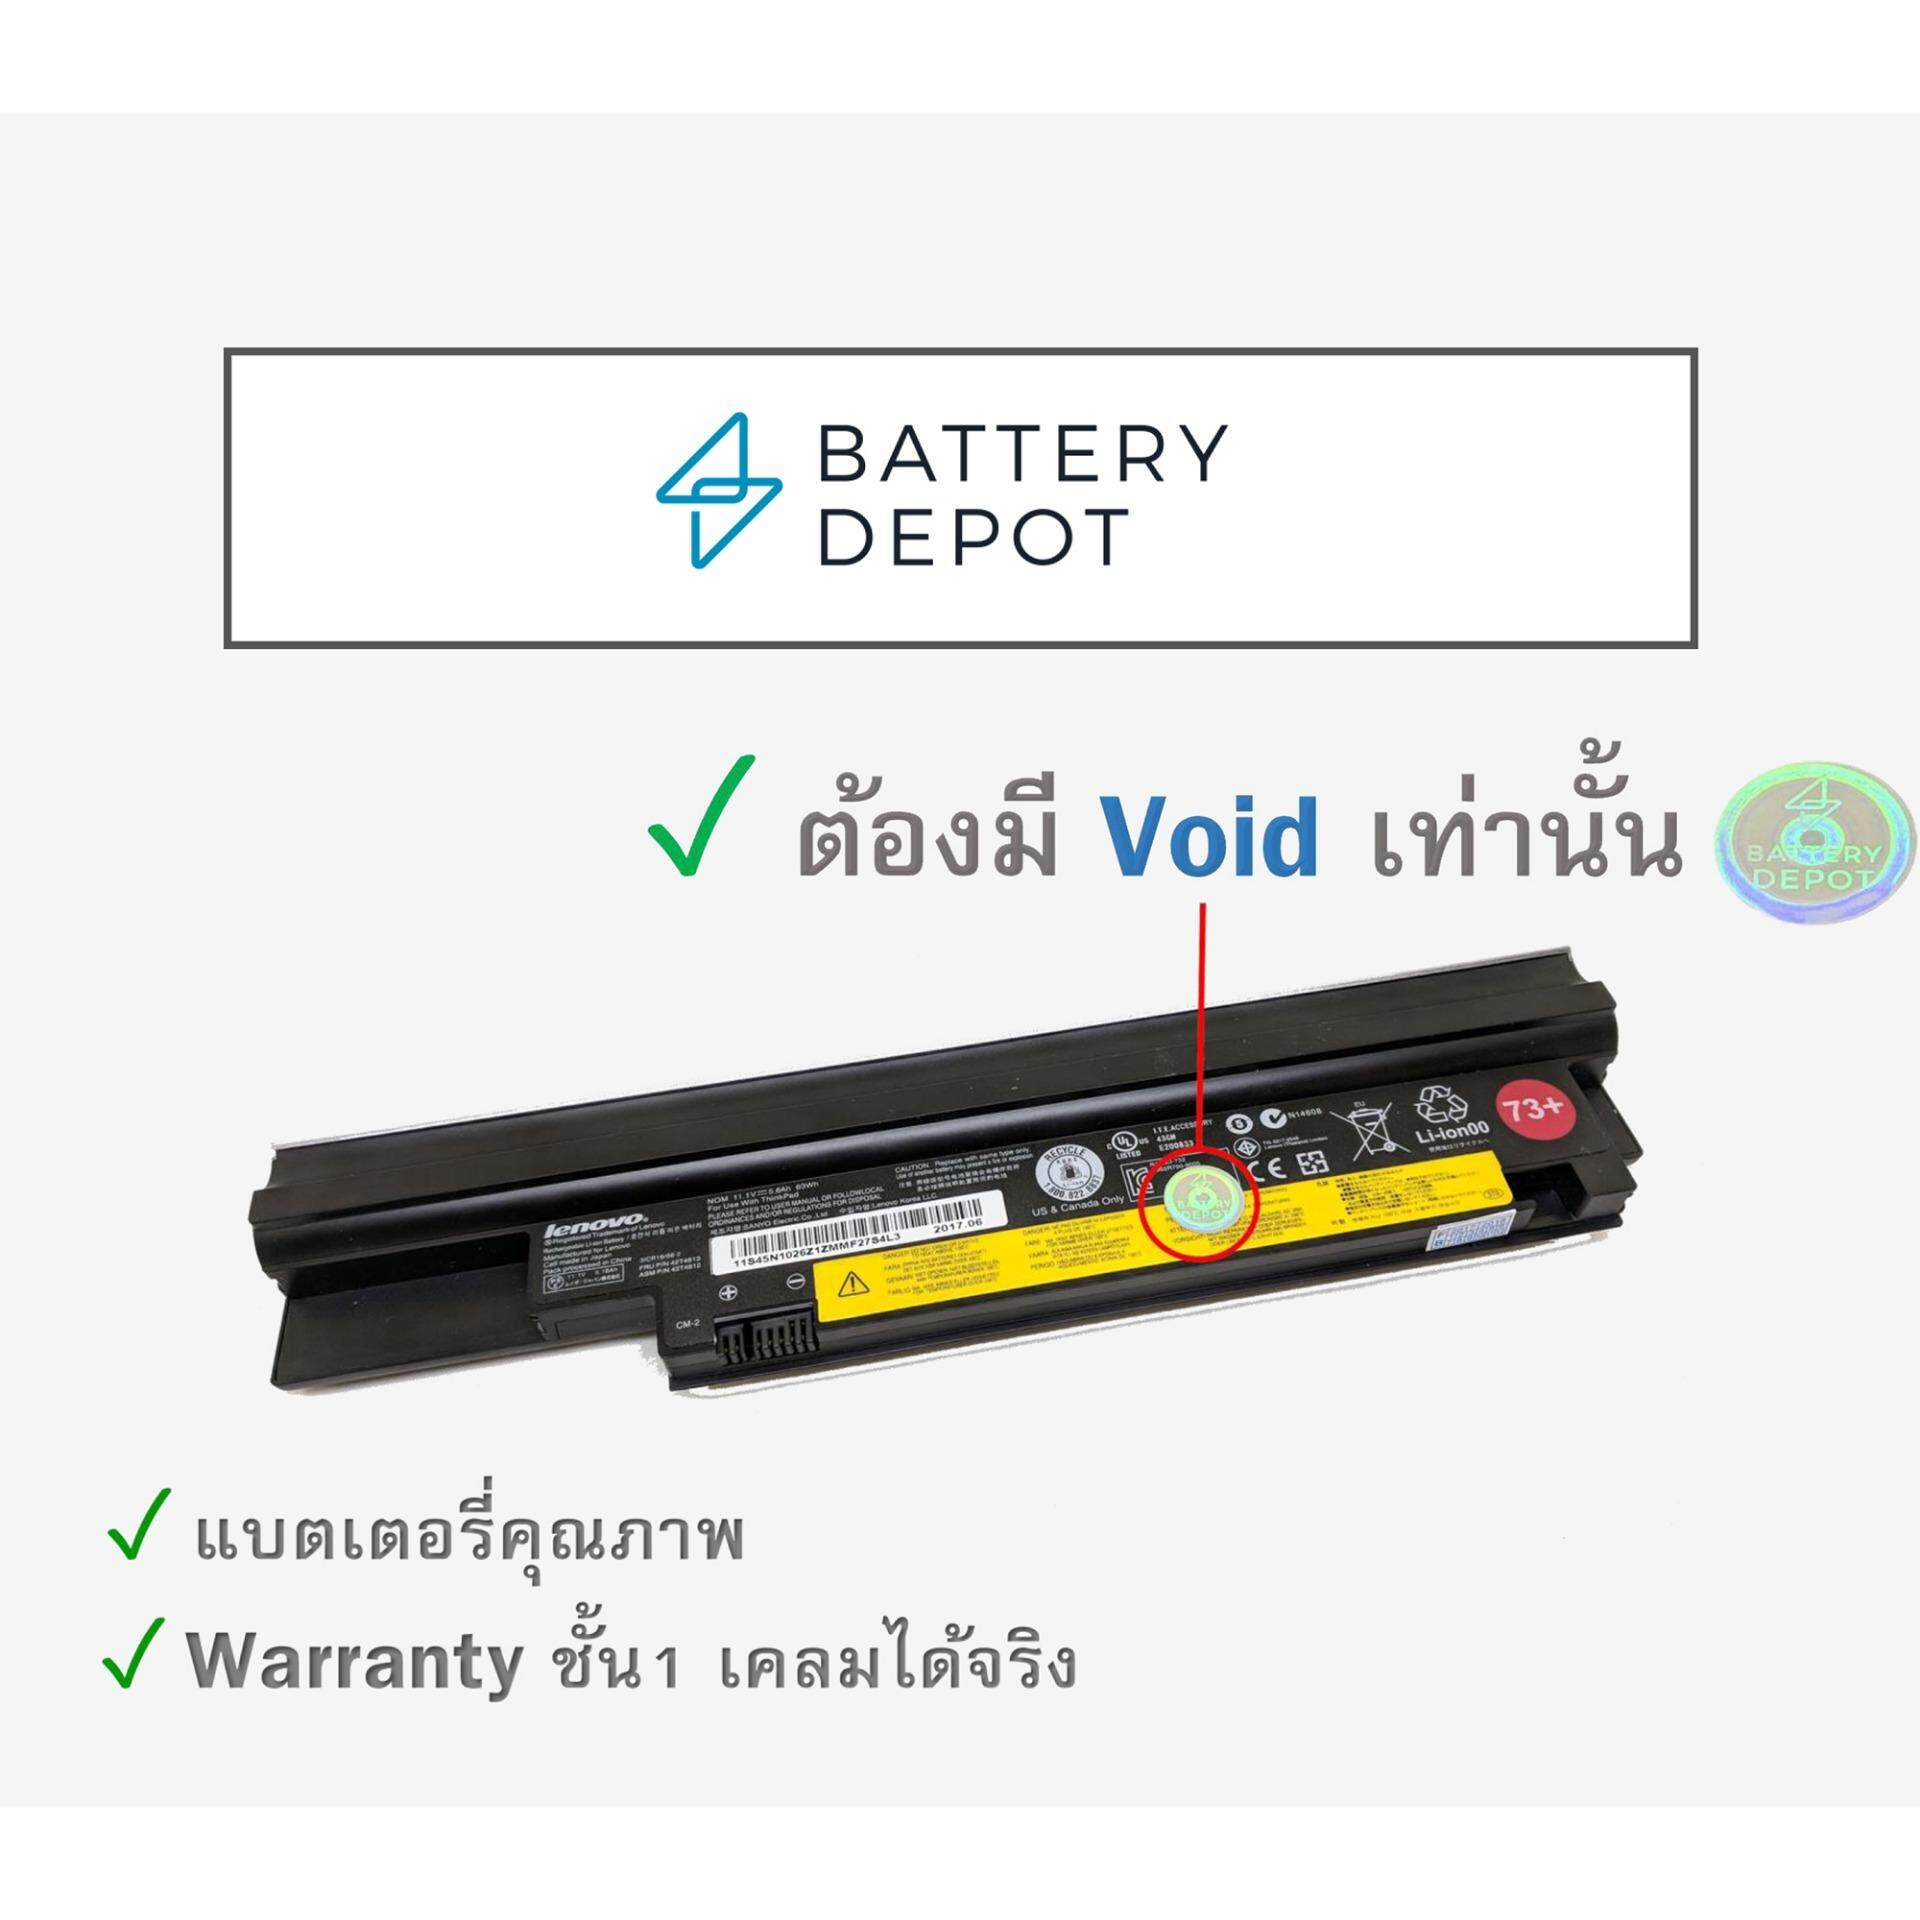 Toshiba Pa5024 Notebook Battery Satellite L800 Pro Original Baterai C800 C800d C840 C840d C845 C870 L805 L830 L835 L840 L845 L850 M840 M805 M800 P800 S800 P870 L855 L870 L875 Series Pa5024u 1brs